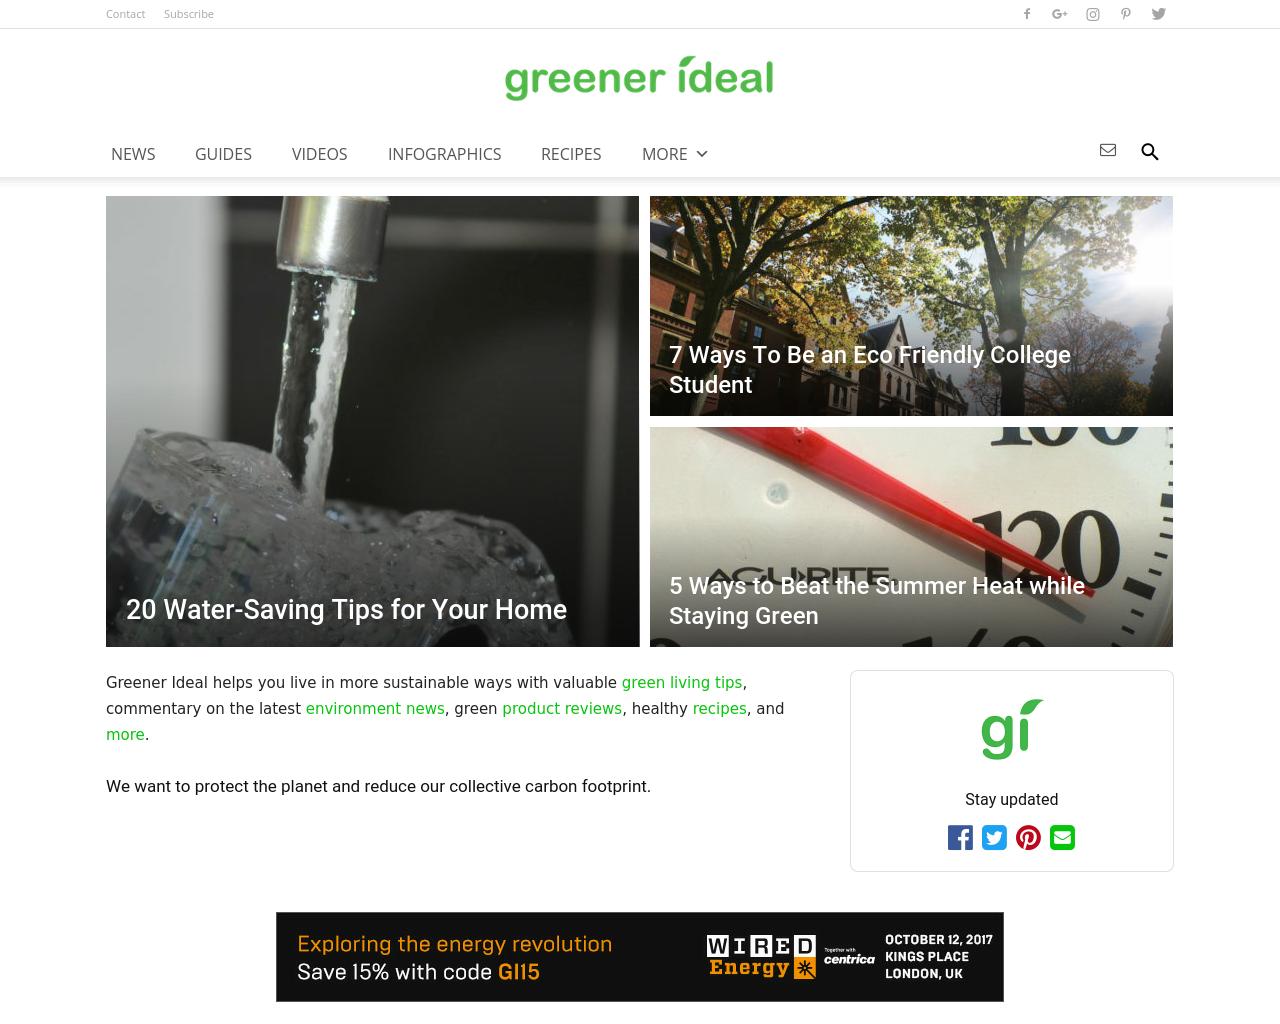 greener-ideal-Advertising-Reviews-Pricing